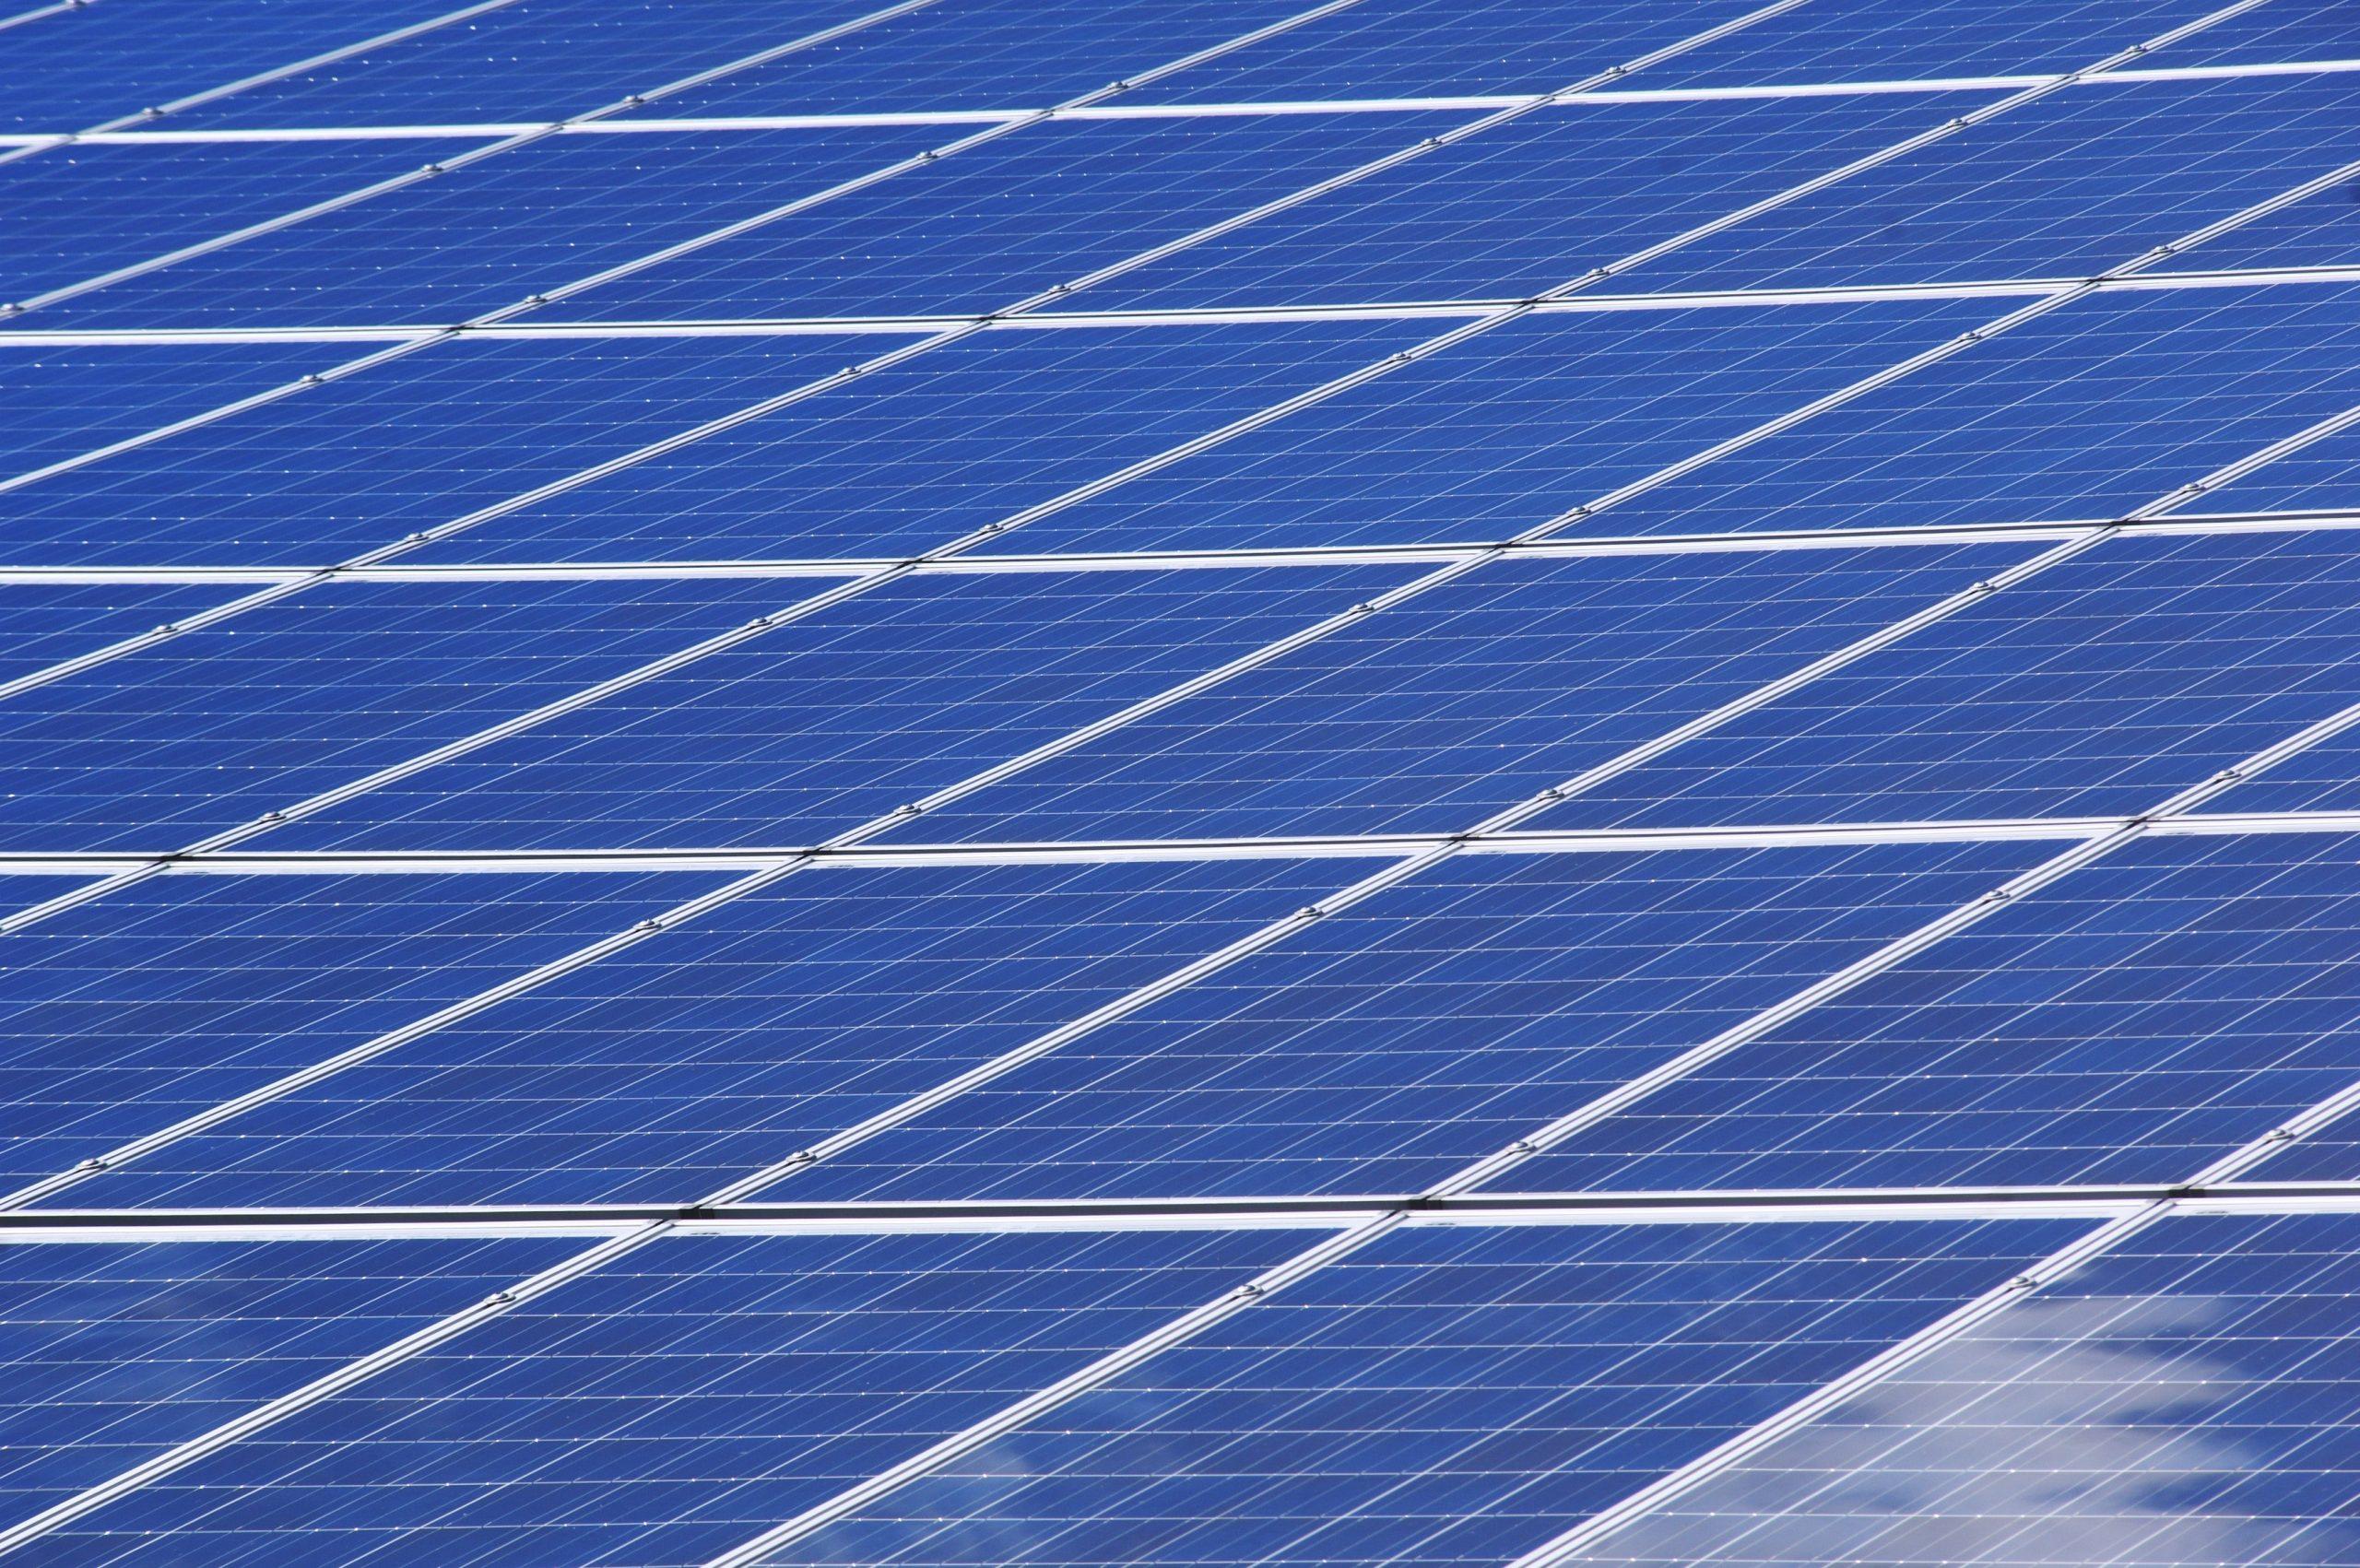 Benefits of Installing Solar Panels